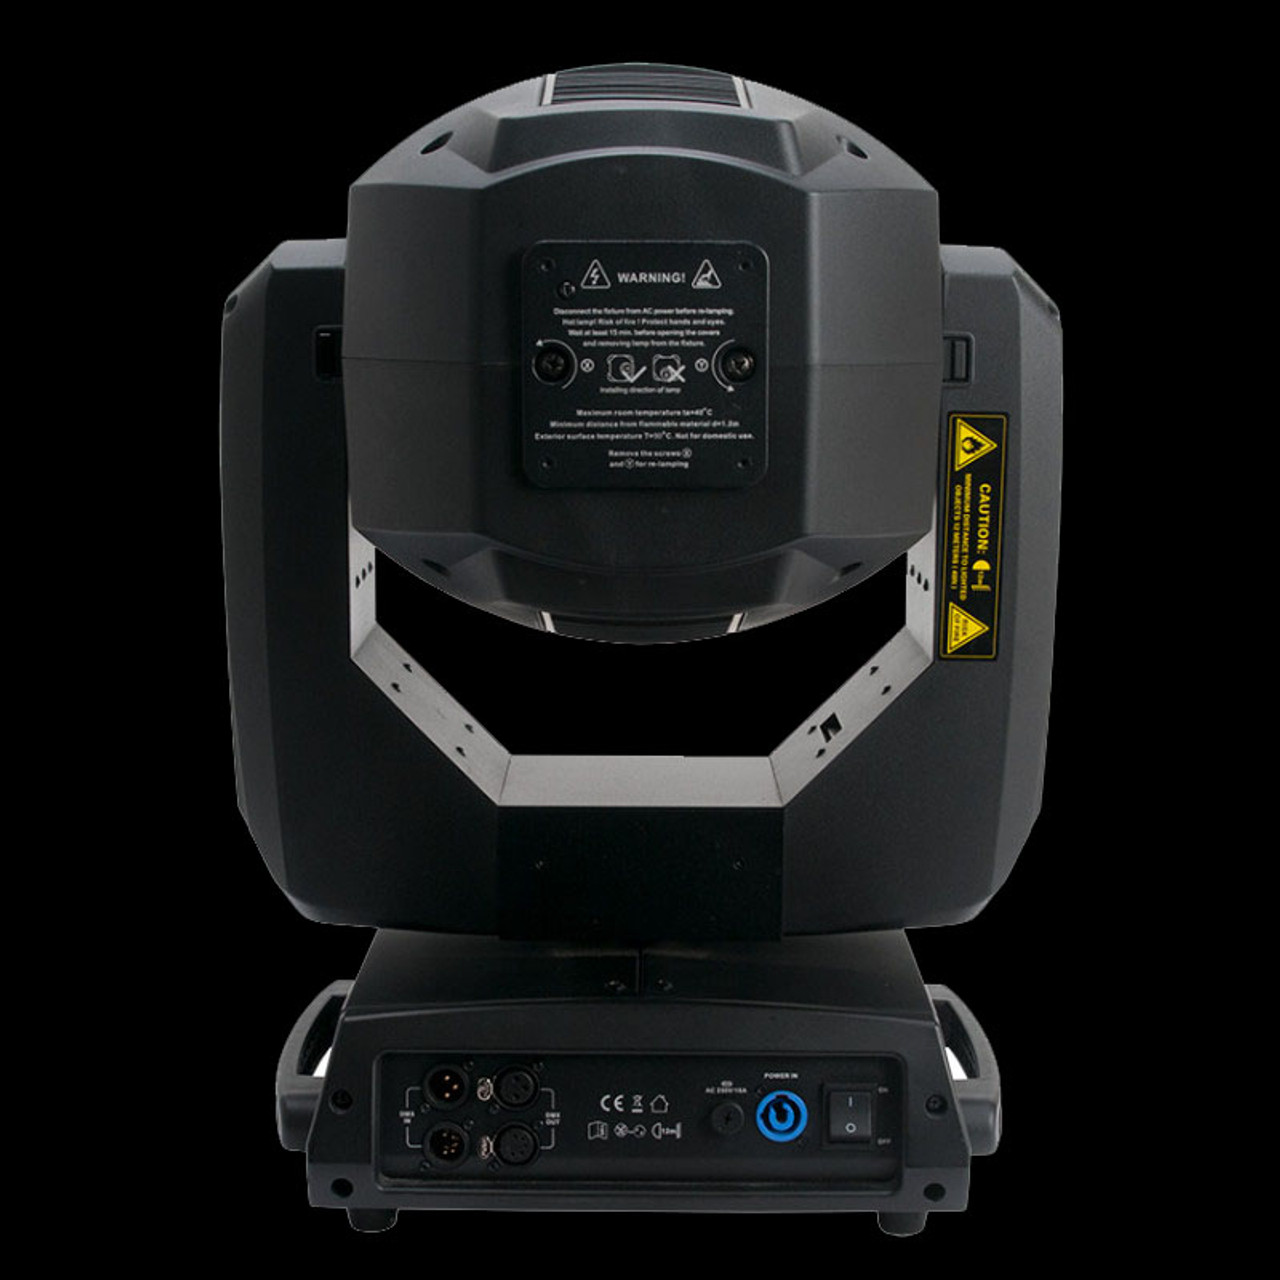 ADJ Vizi CMY 16RX Hybrid Moving Head Light Fixture